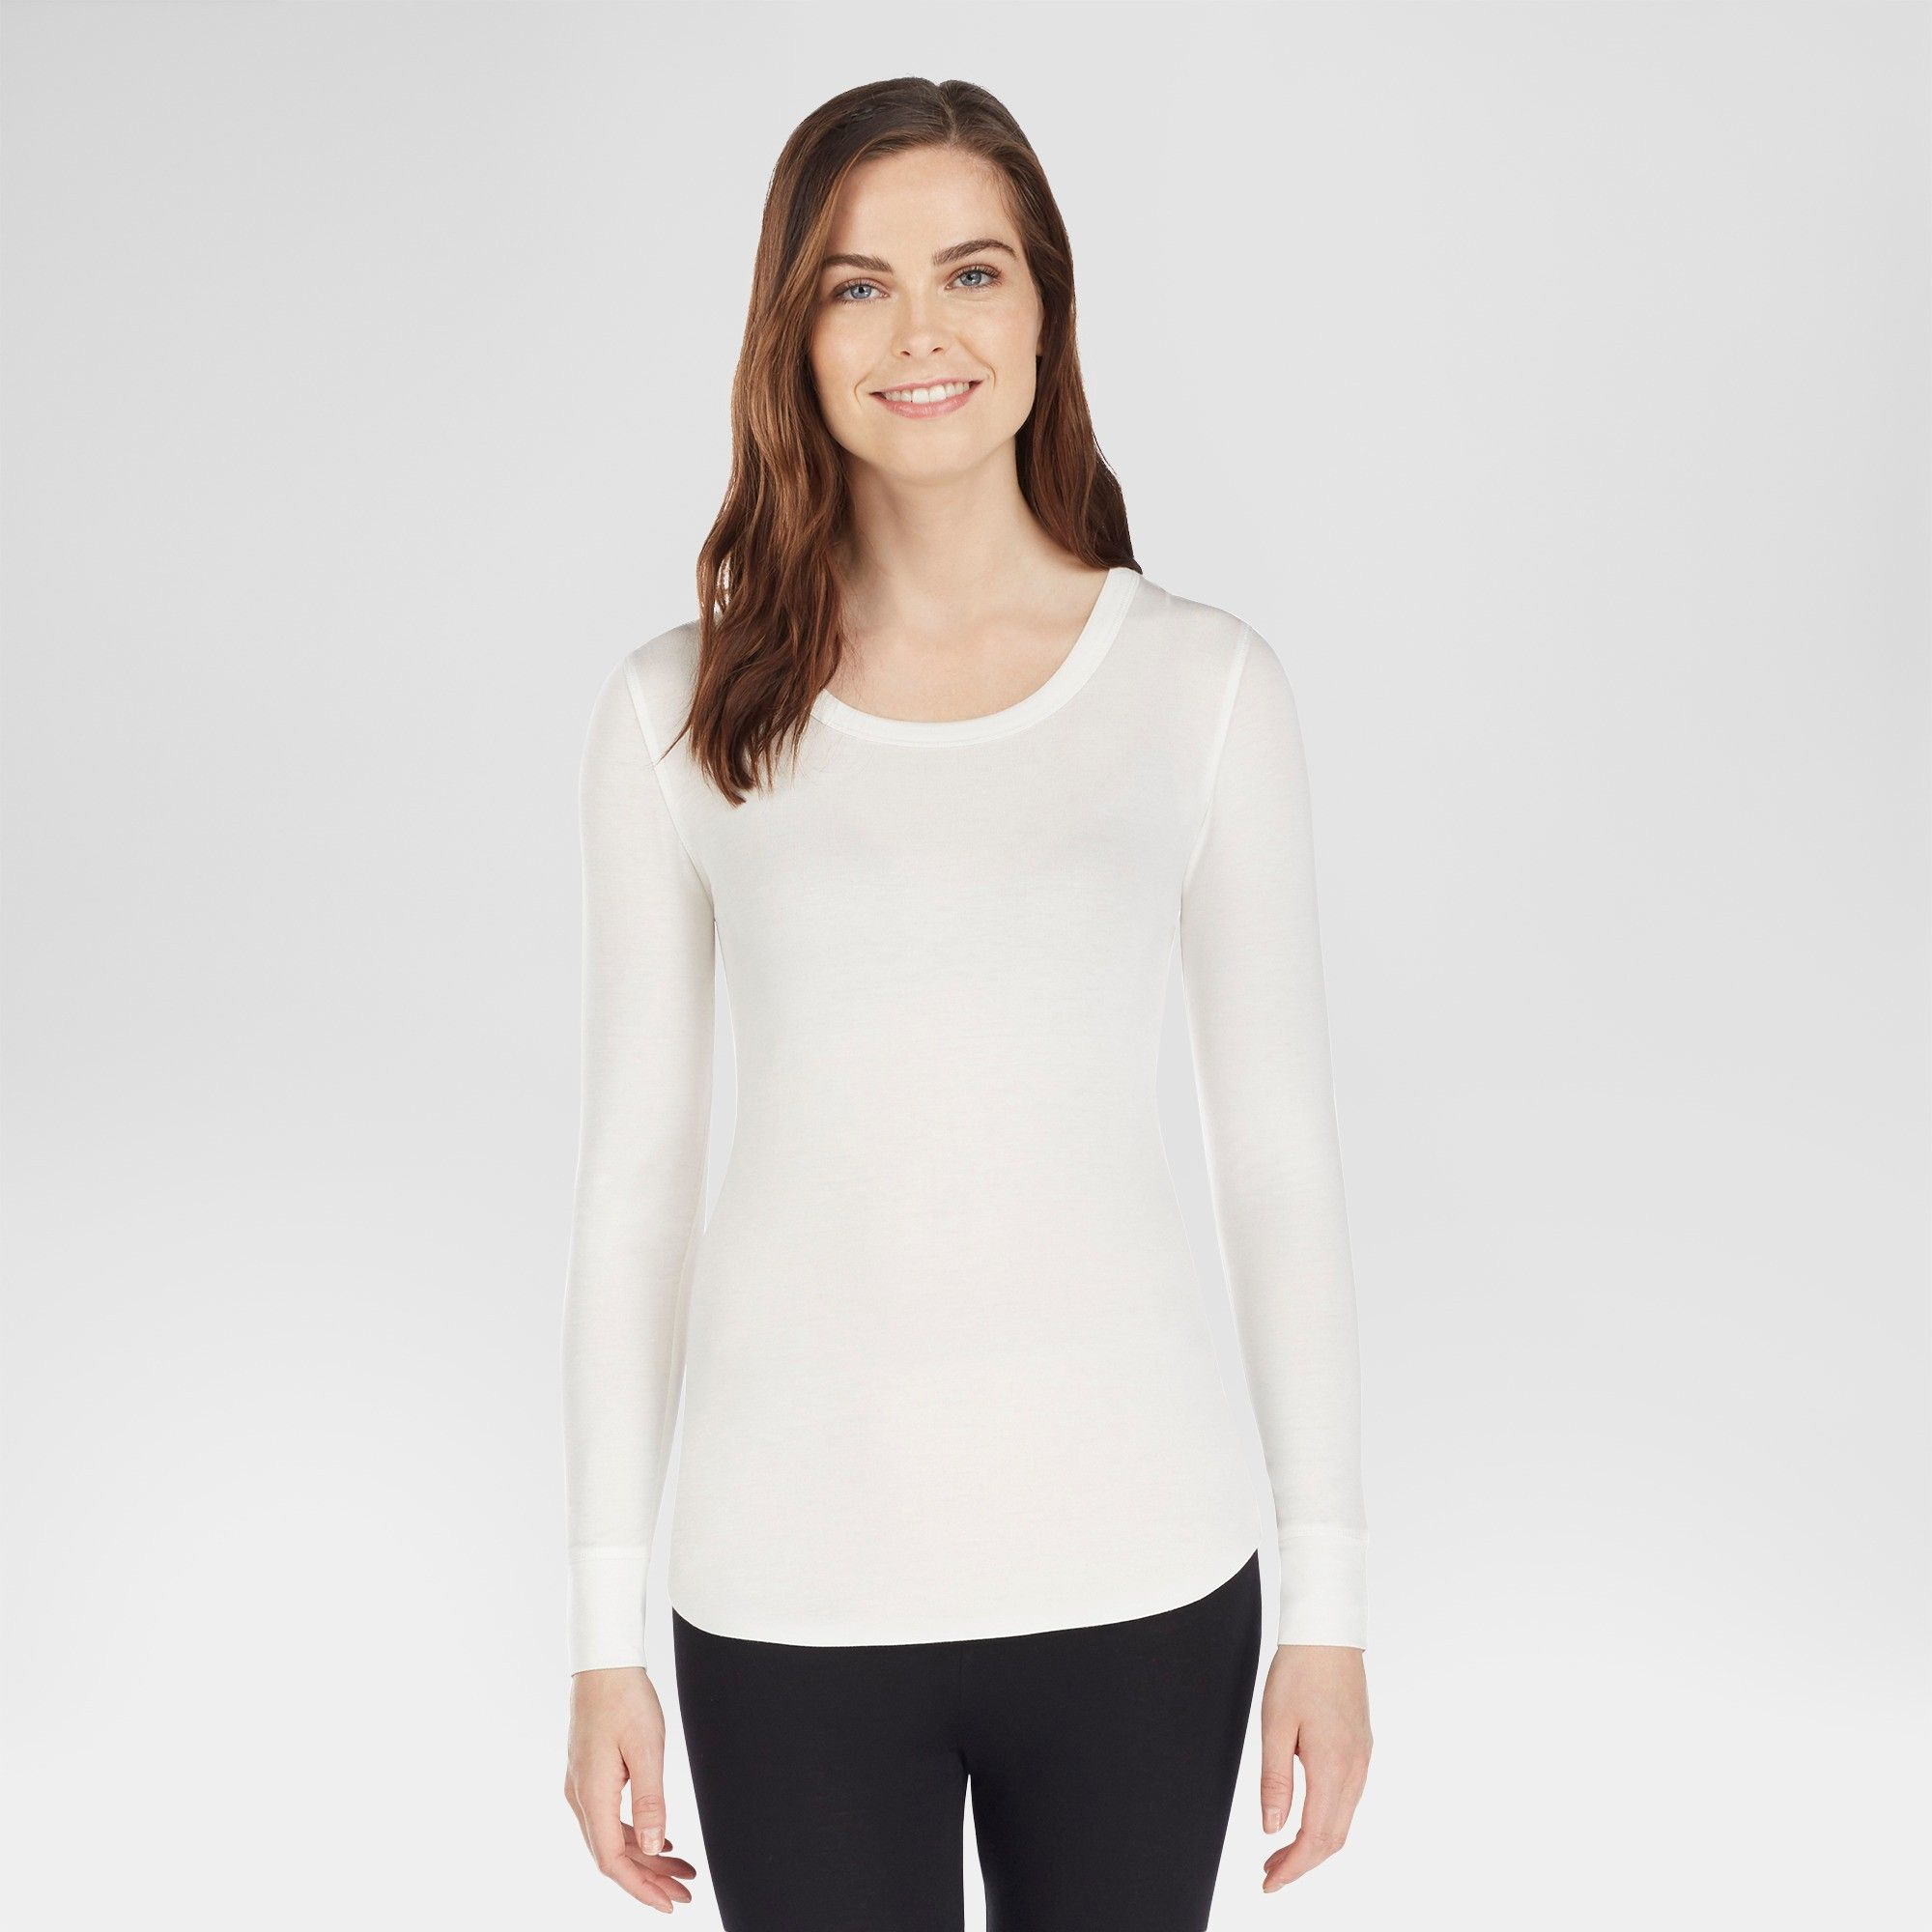 53a386bbef9 Warm Essentials by Cuddl Duds Women's Smooth Stretch Thermal Scoop Neck -  Ivory 3X, Size: 2XL